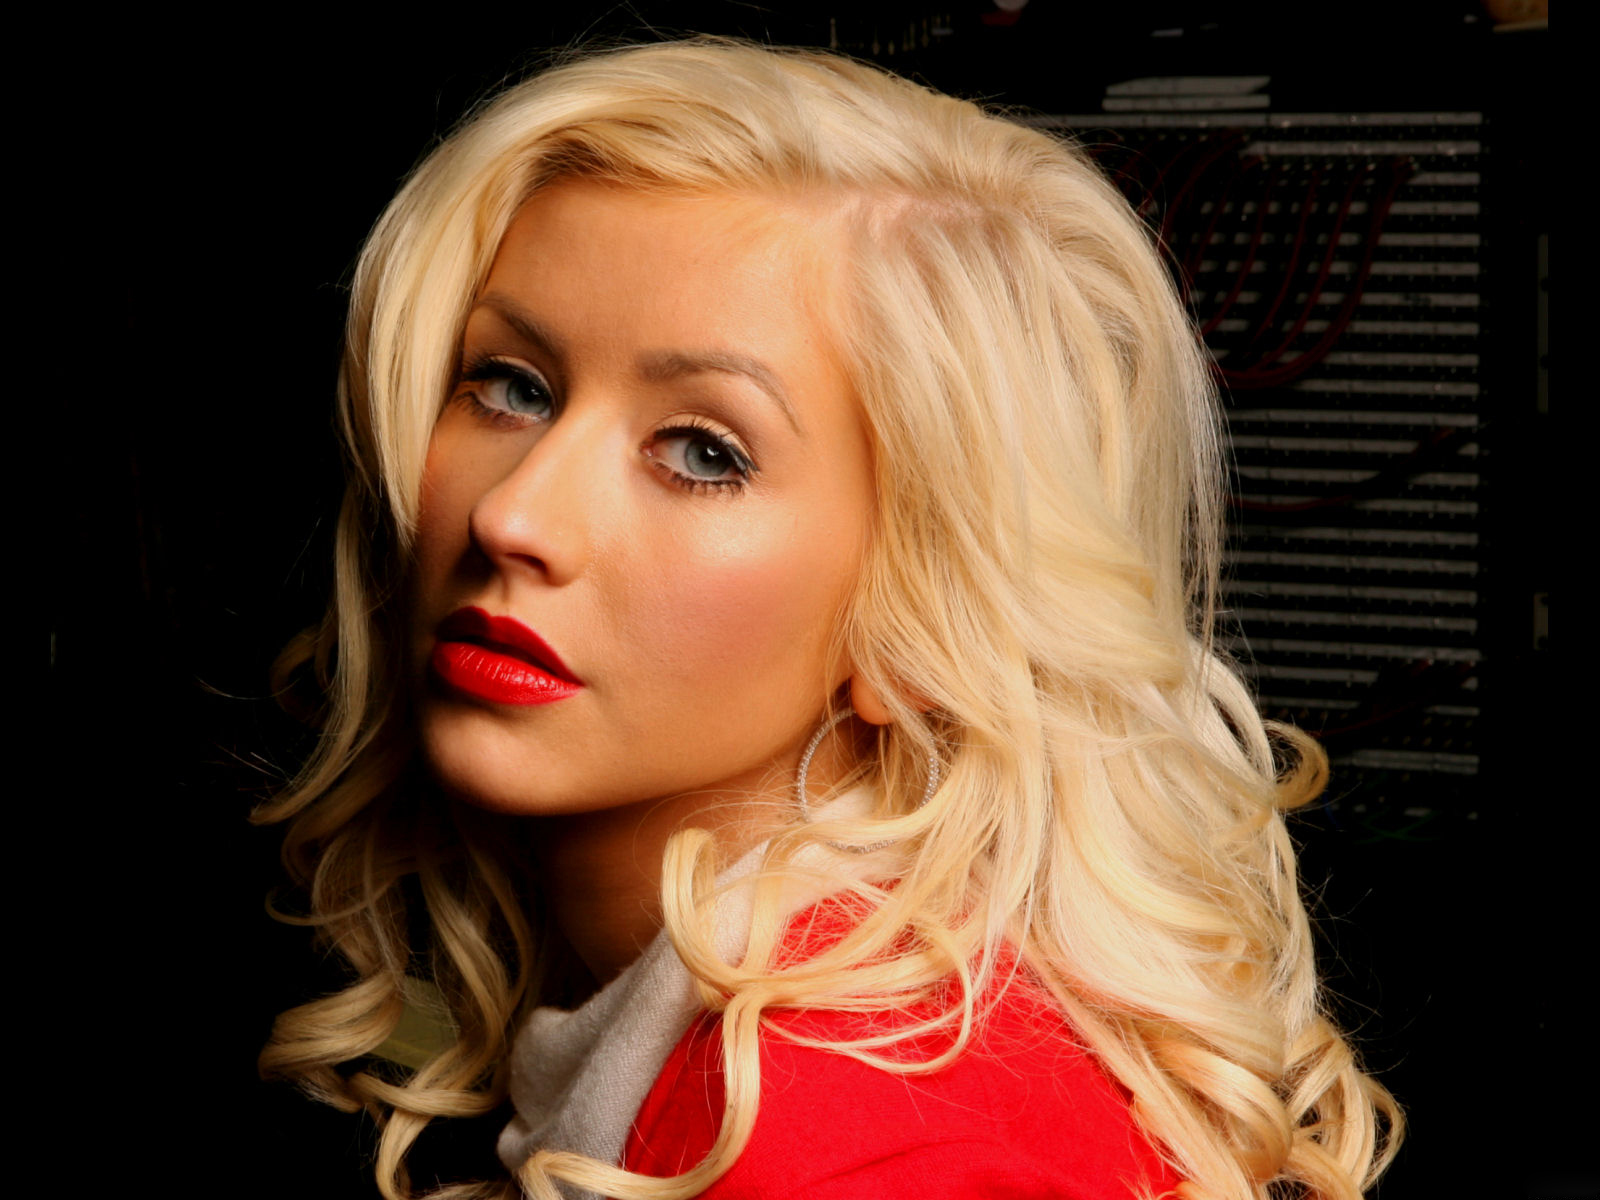 Xtina Aguilera Christina Aguilera Photo 29910244